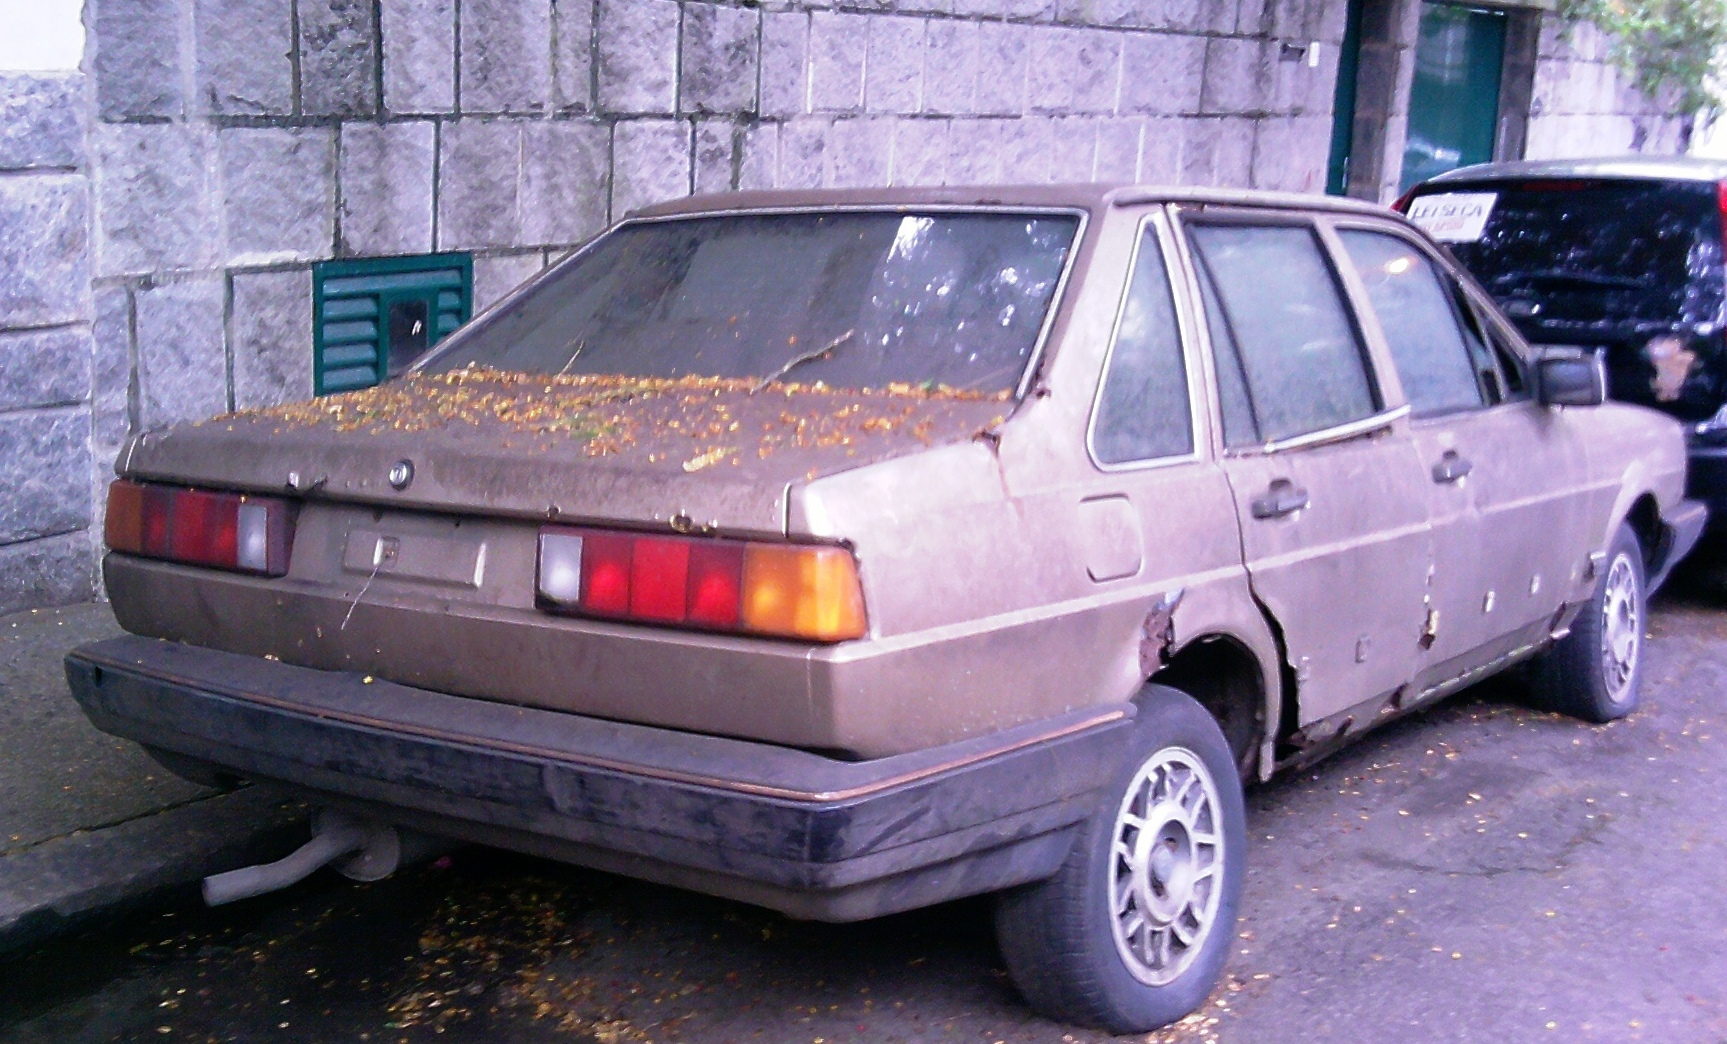 erick-santana-87-botafogo-rio-de-janeiro-2 POST 696! Volkswagen Santana